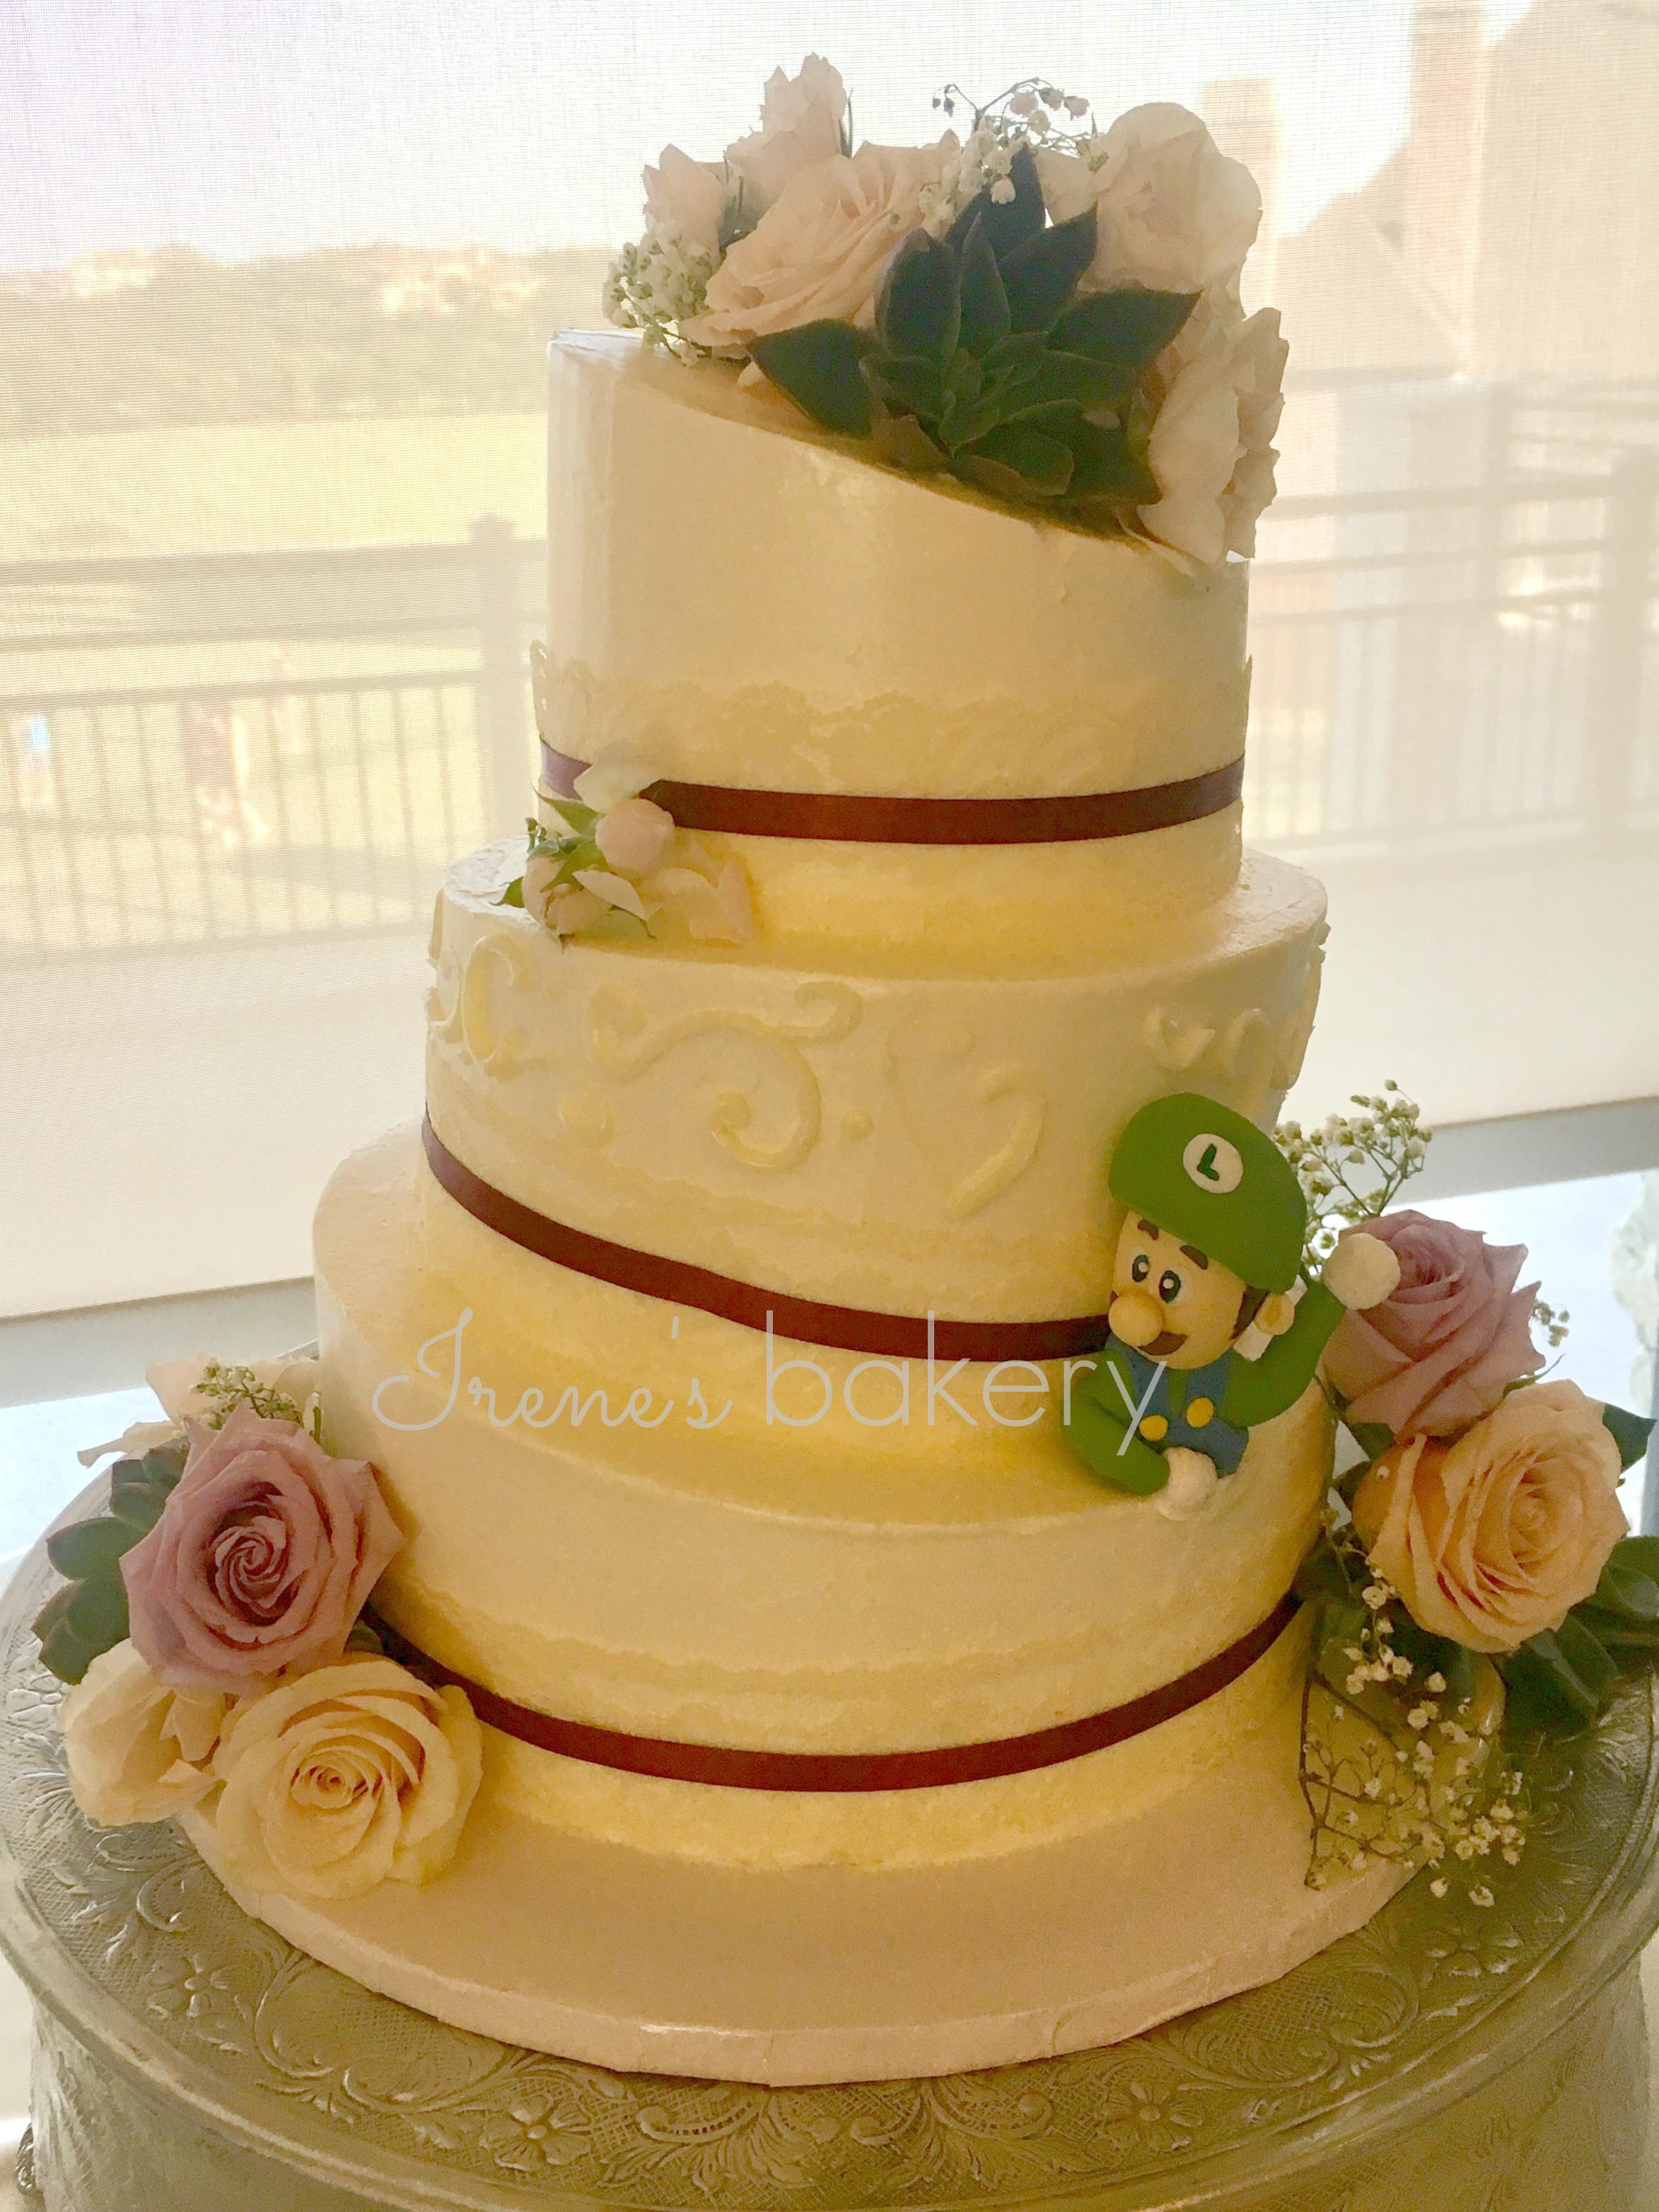 Sam'S Bakery Wedding Cakes  Wedding Cakes irenes bakery